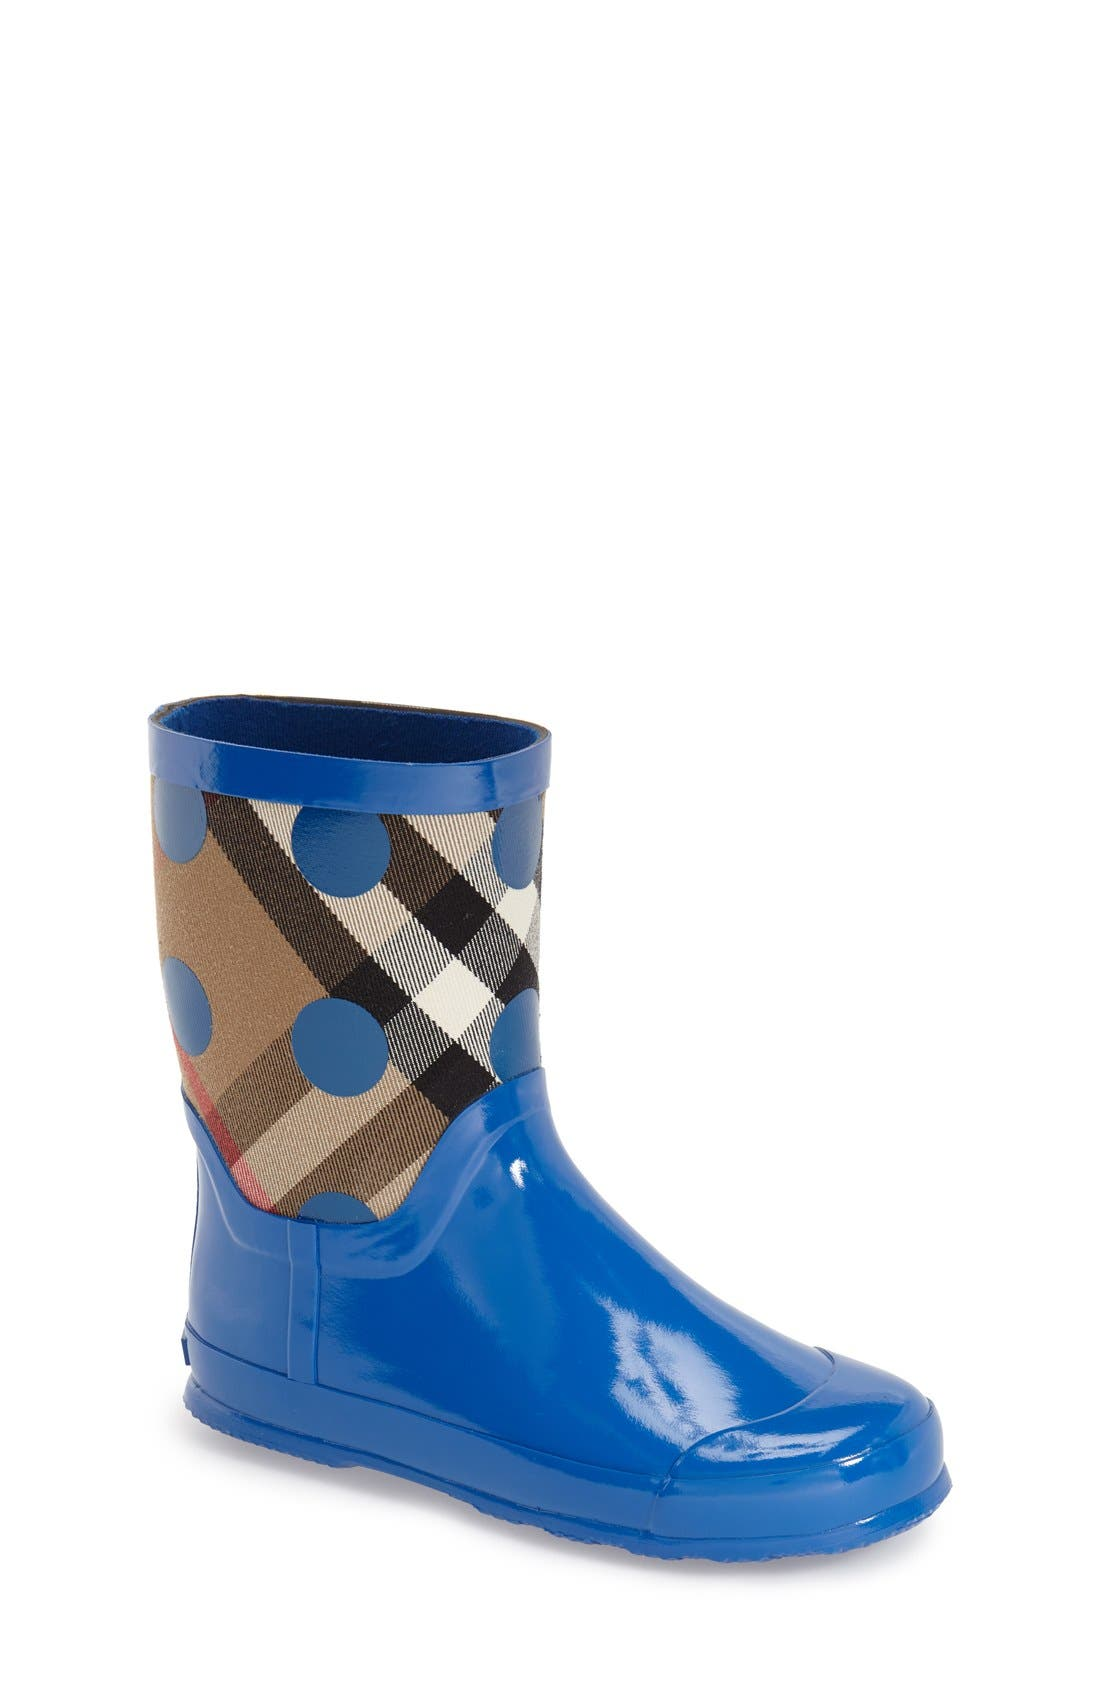 Ranmoor Waterproof Rain Boot,                             Main thumbnail 1, color,                             424